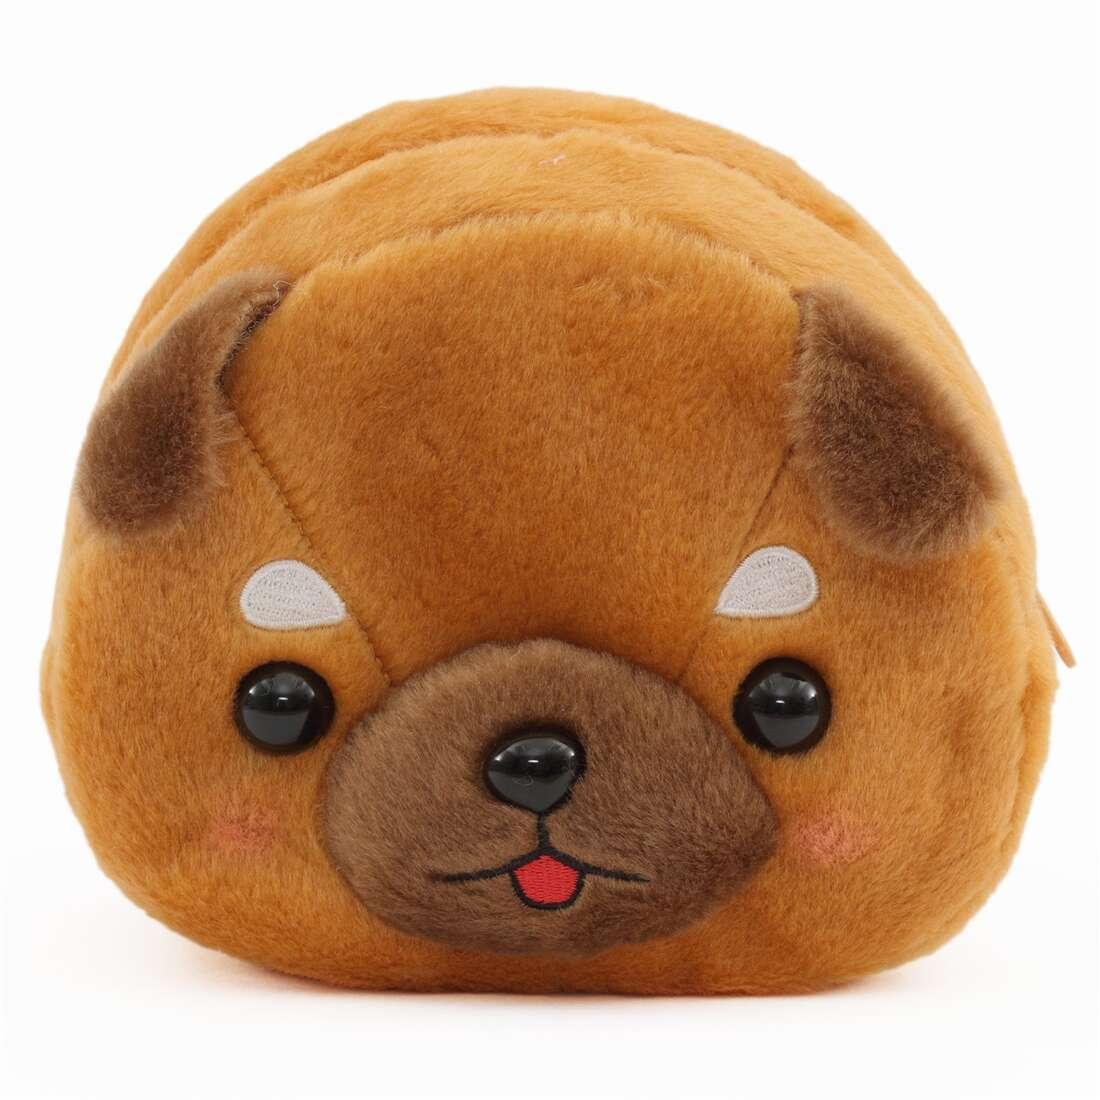 dunkelbraunes ohr brauner beutel mameshiba san kyodai hund pl schtier aus japan hunde. Black Bedroom Furniture Sets. Home Design Ideas